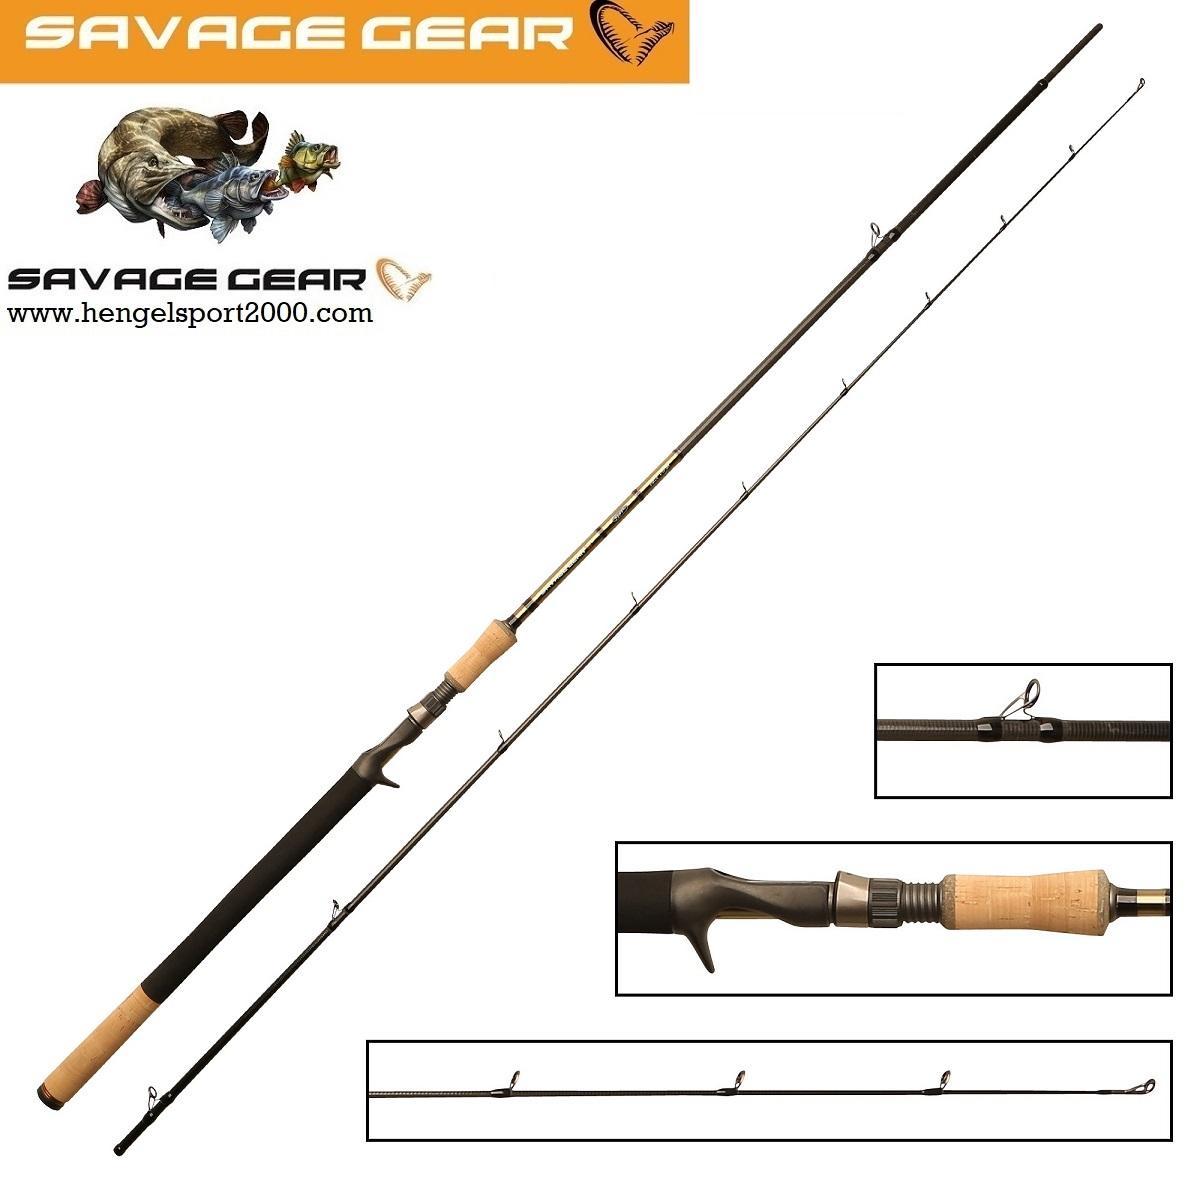 Savage Gear Butch Light XLNT2 258 cm 30 - 80 gram